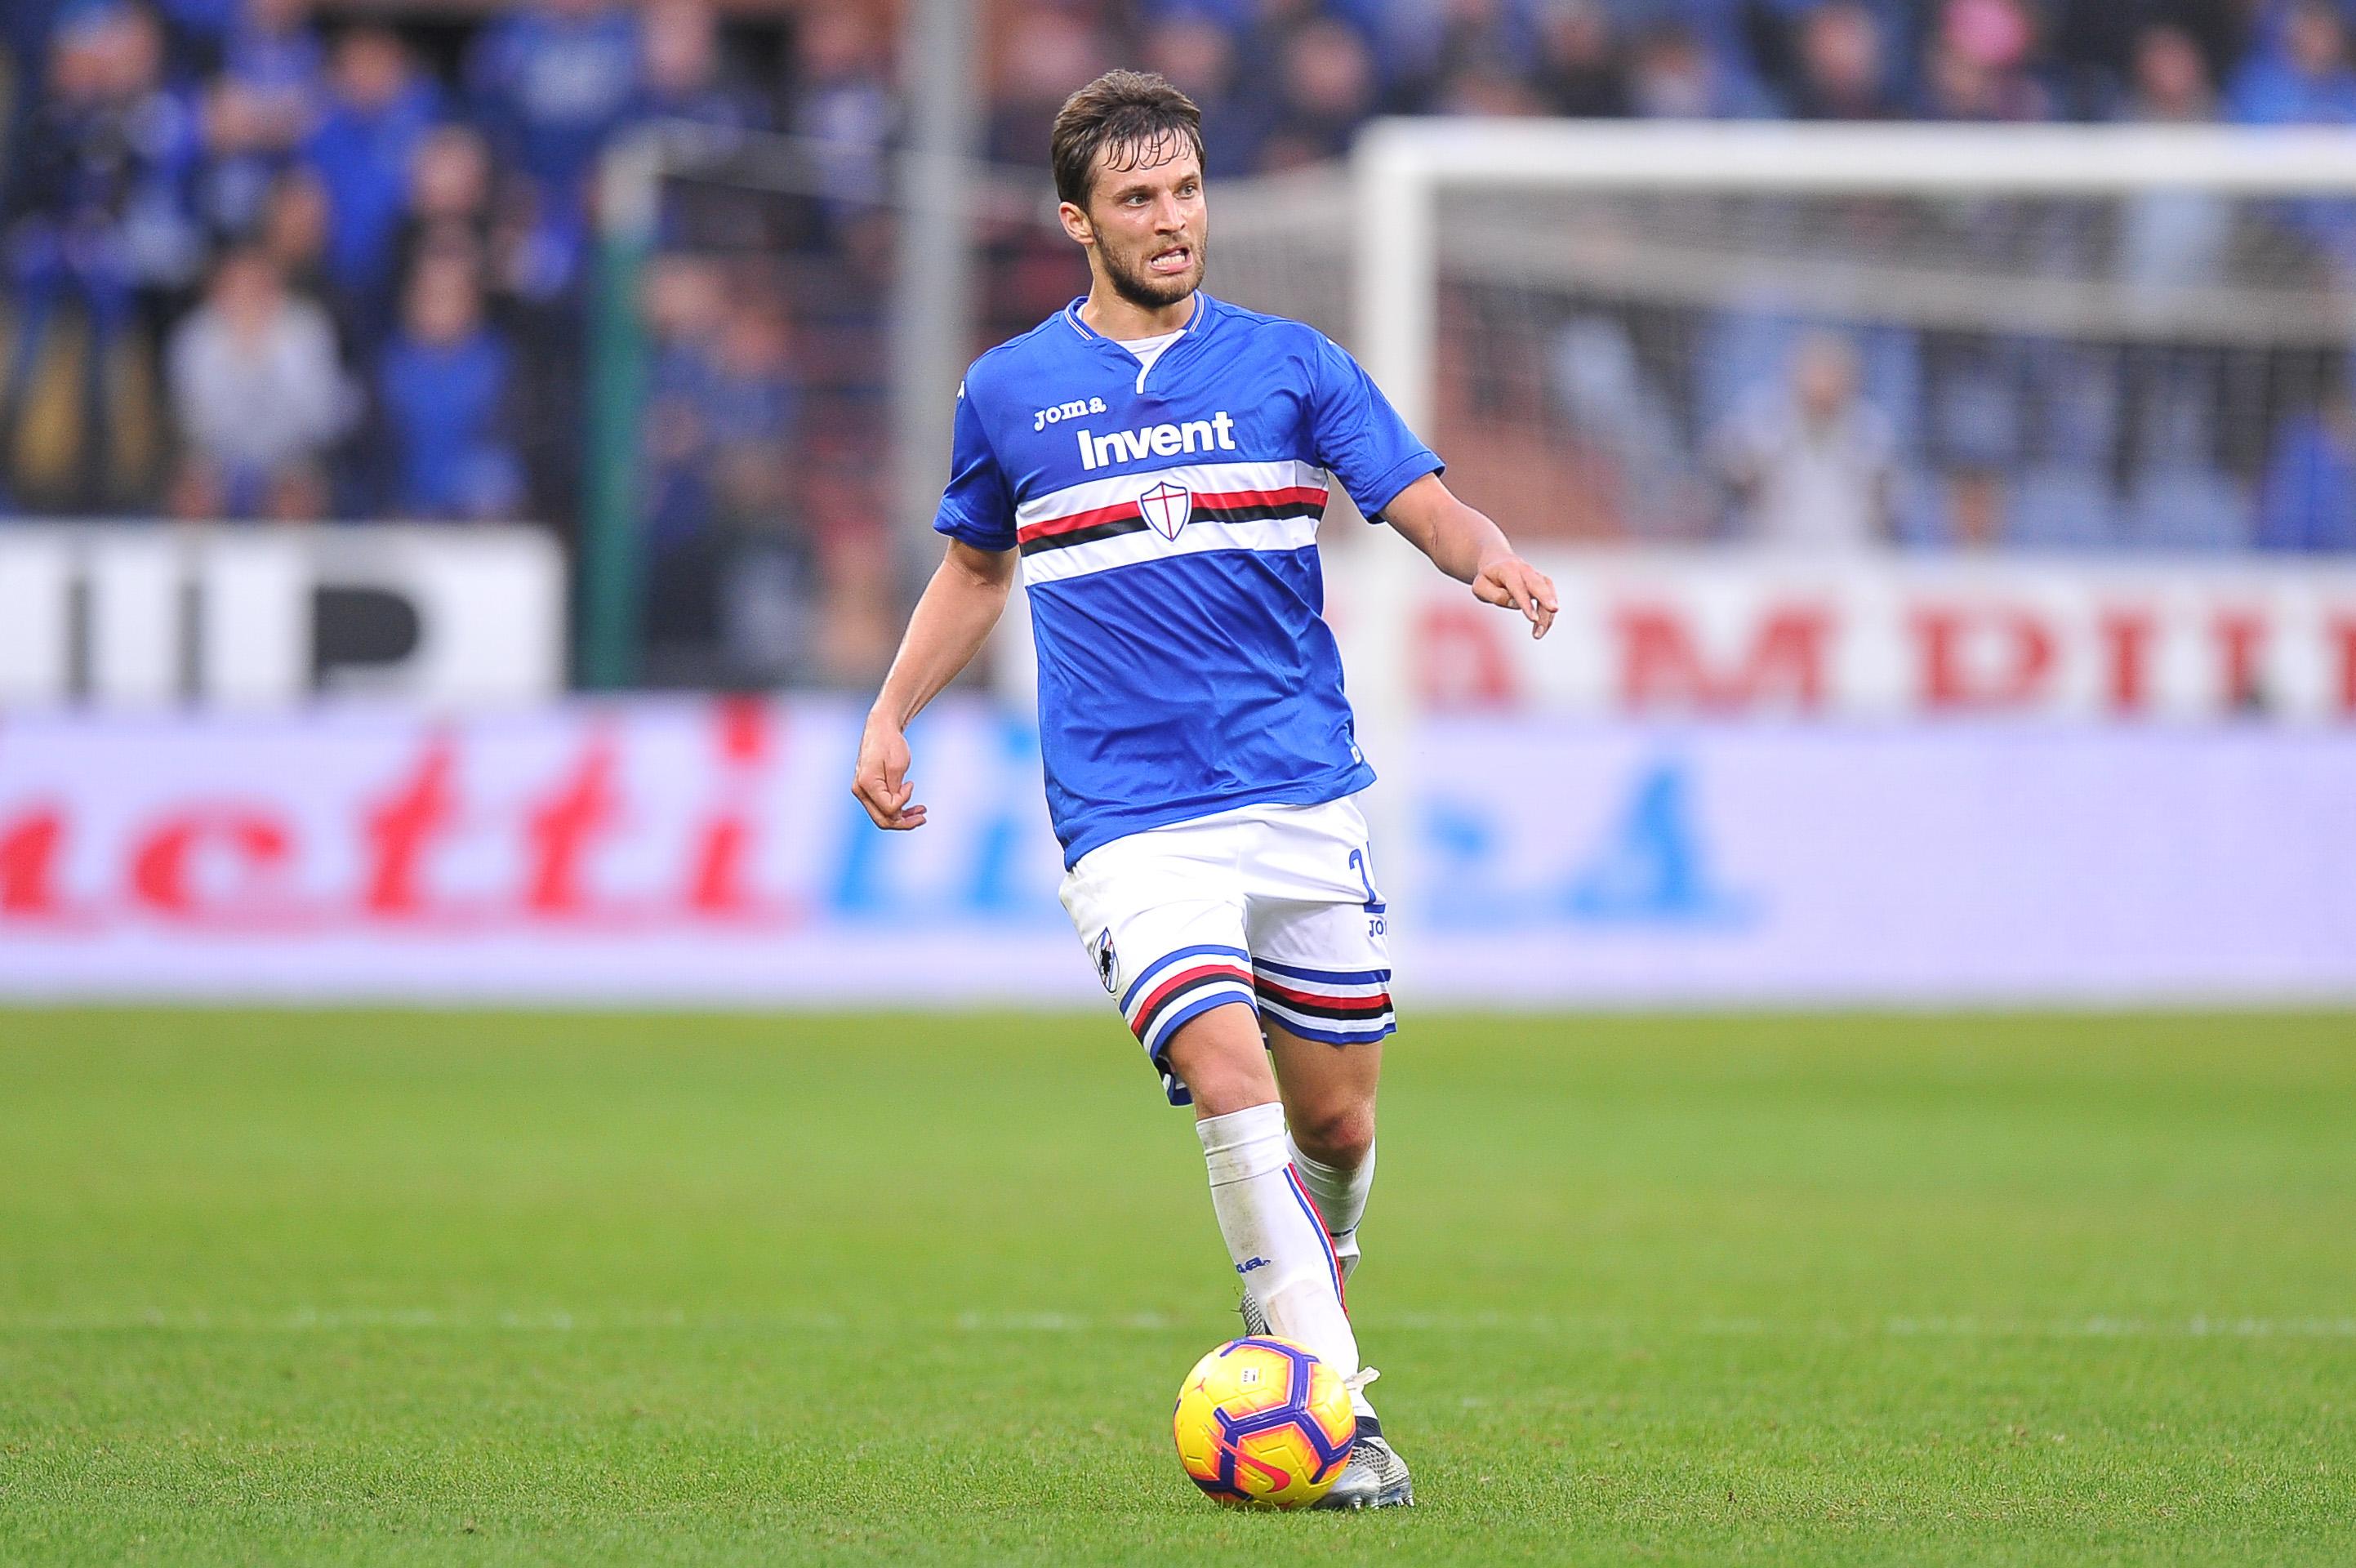 04.11.2018, Genua, Serie A 2018/2019, Sampdoria Genua - Torino FC N/z: Bartosz Bereszynski, Foto Norbert Barczyk / PressFocus